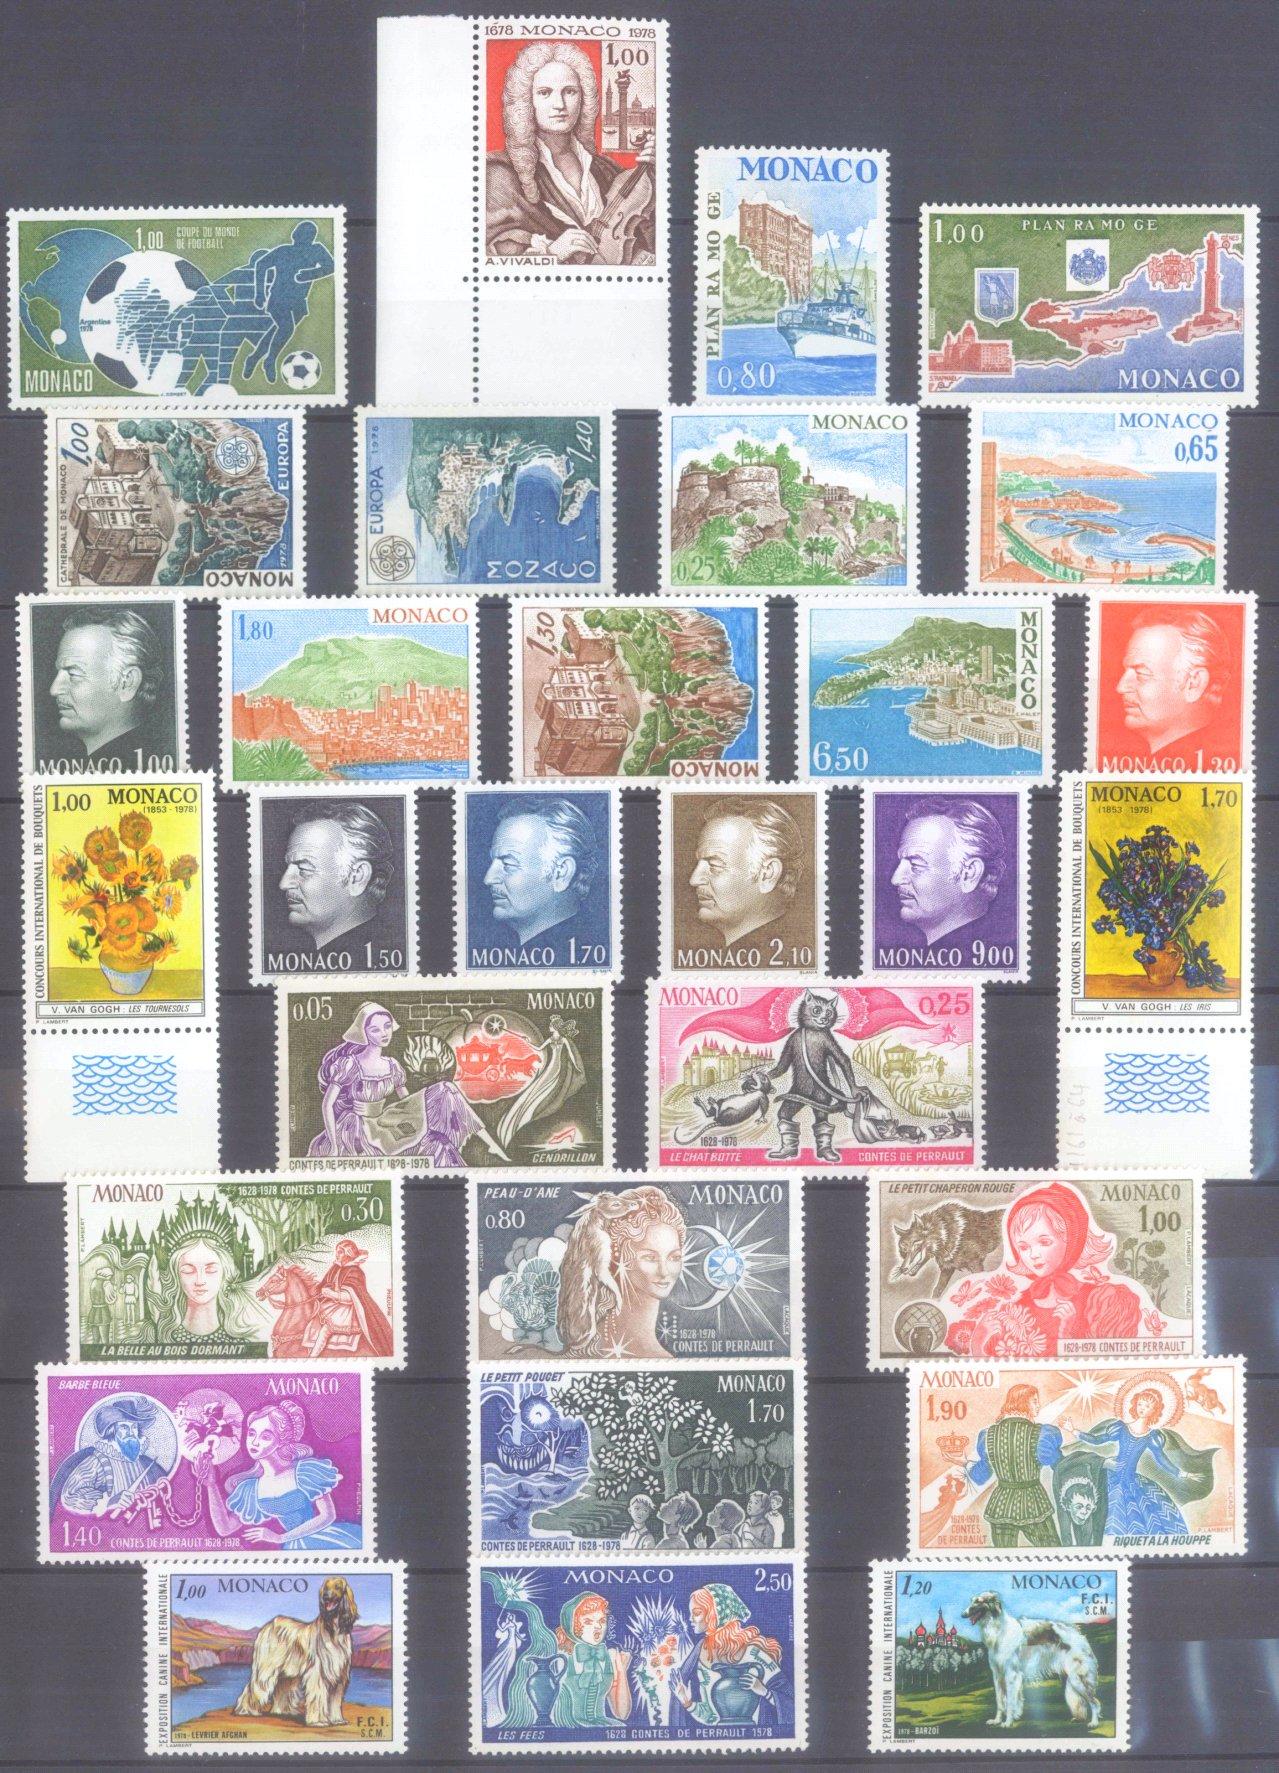 MONACO 1953-1989, Katalogwert 970,- Euro-10